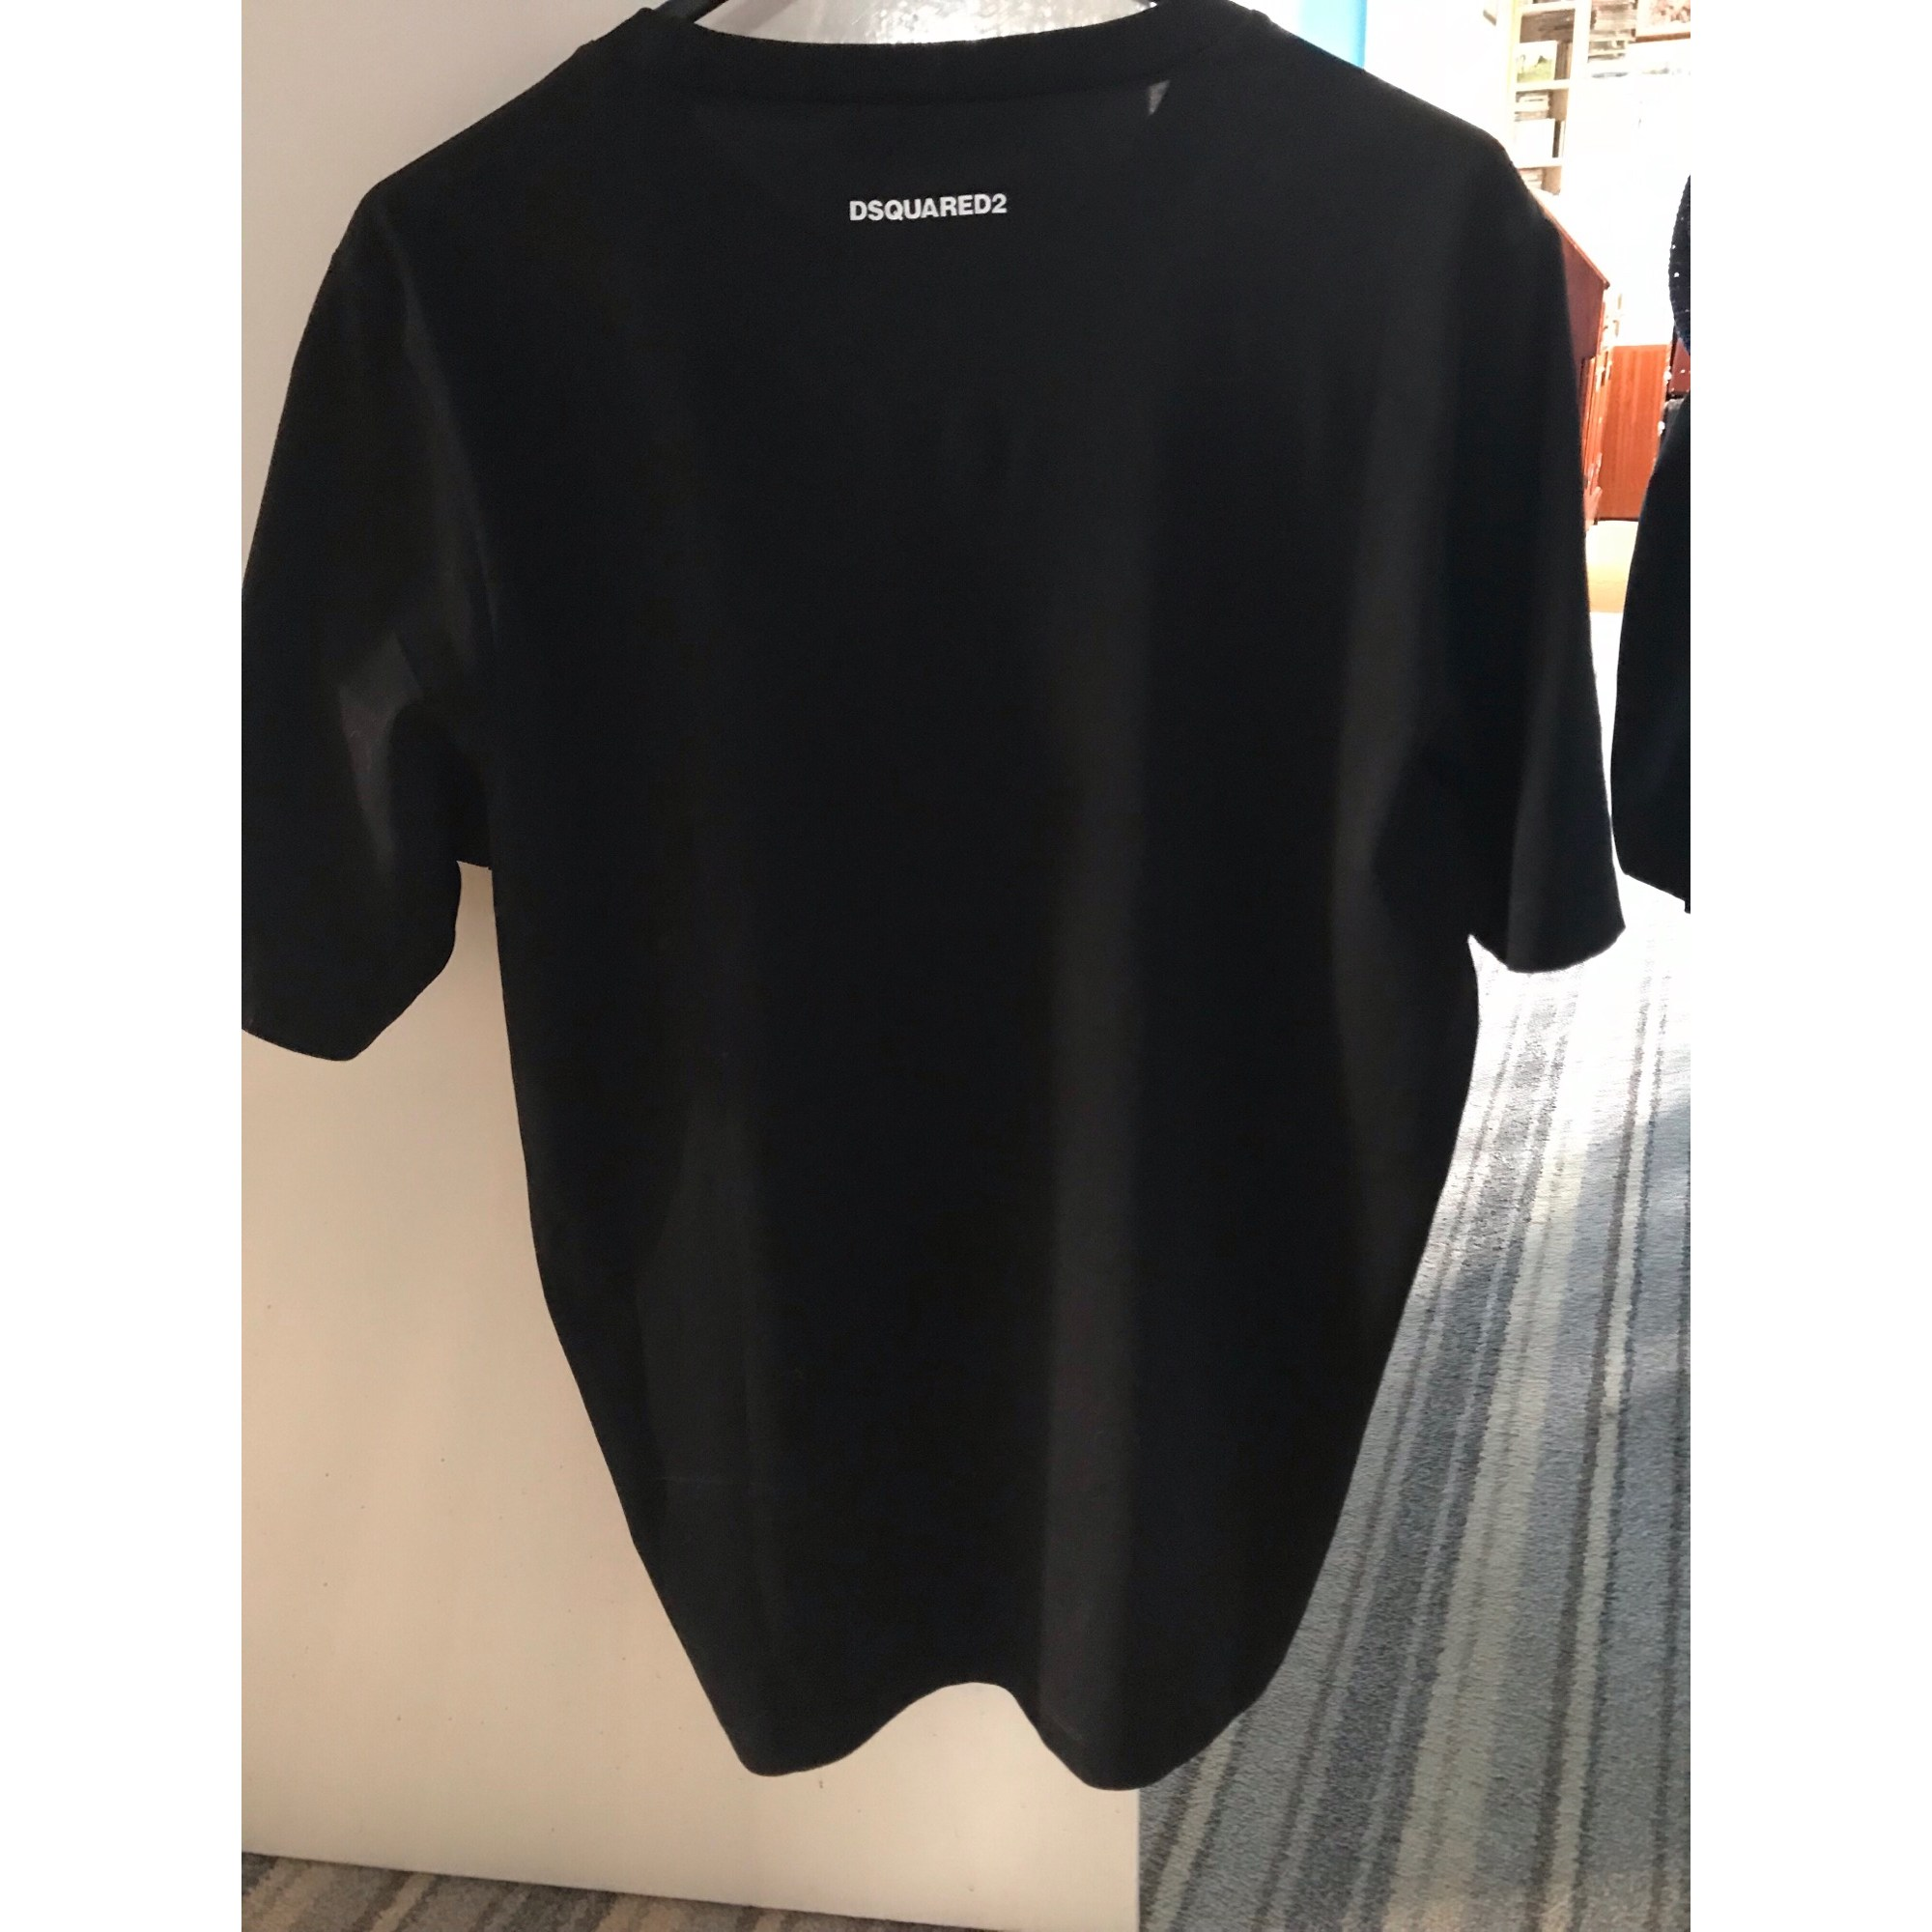 Tee Shirt Dsquared 2 M Noir 8143738